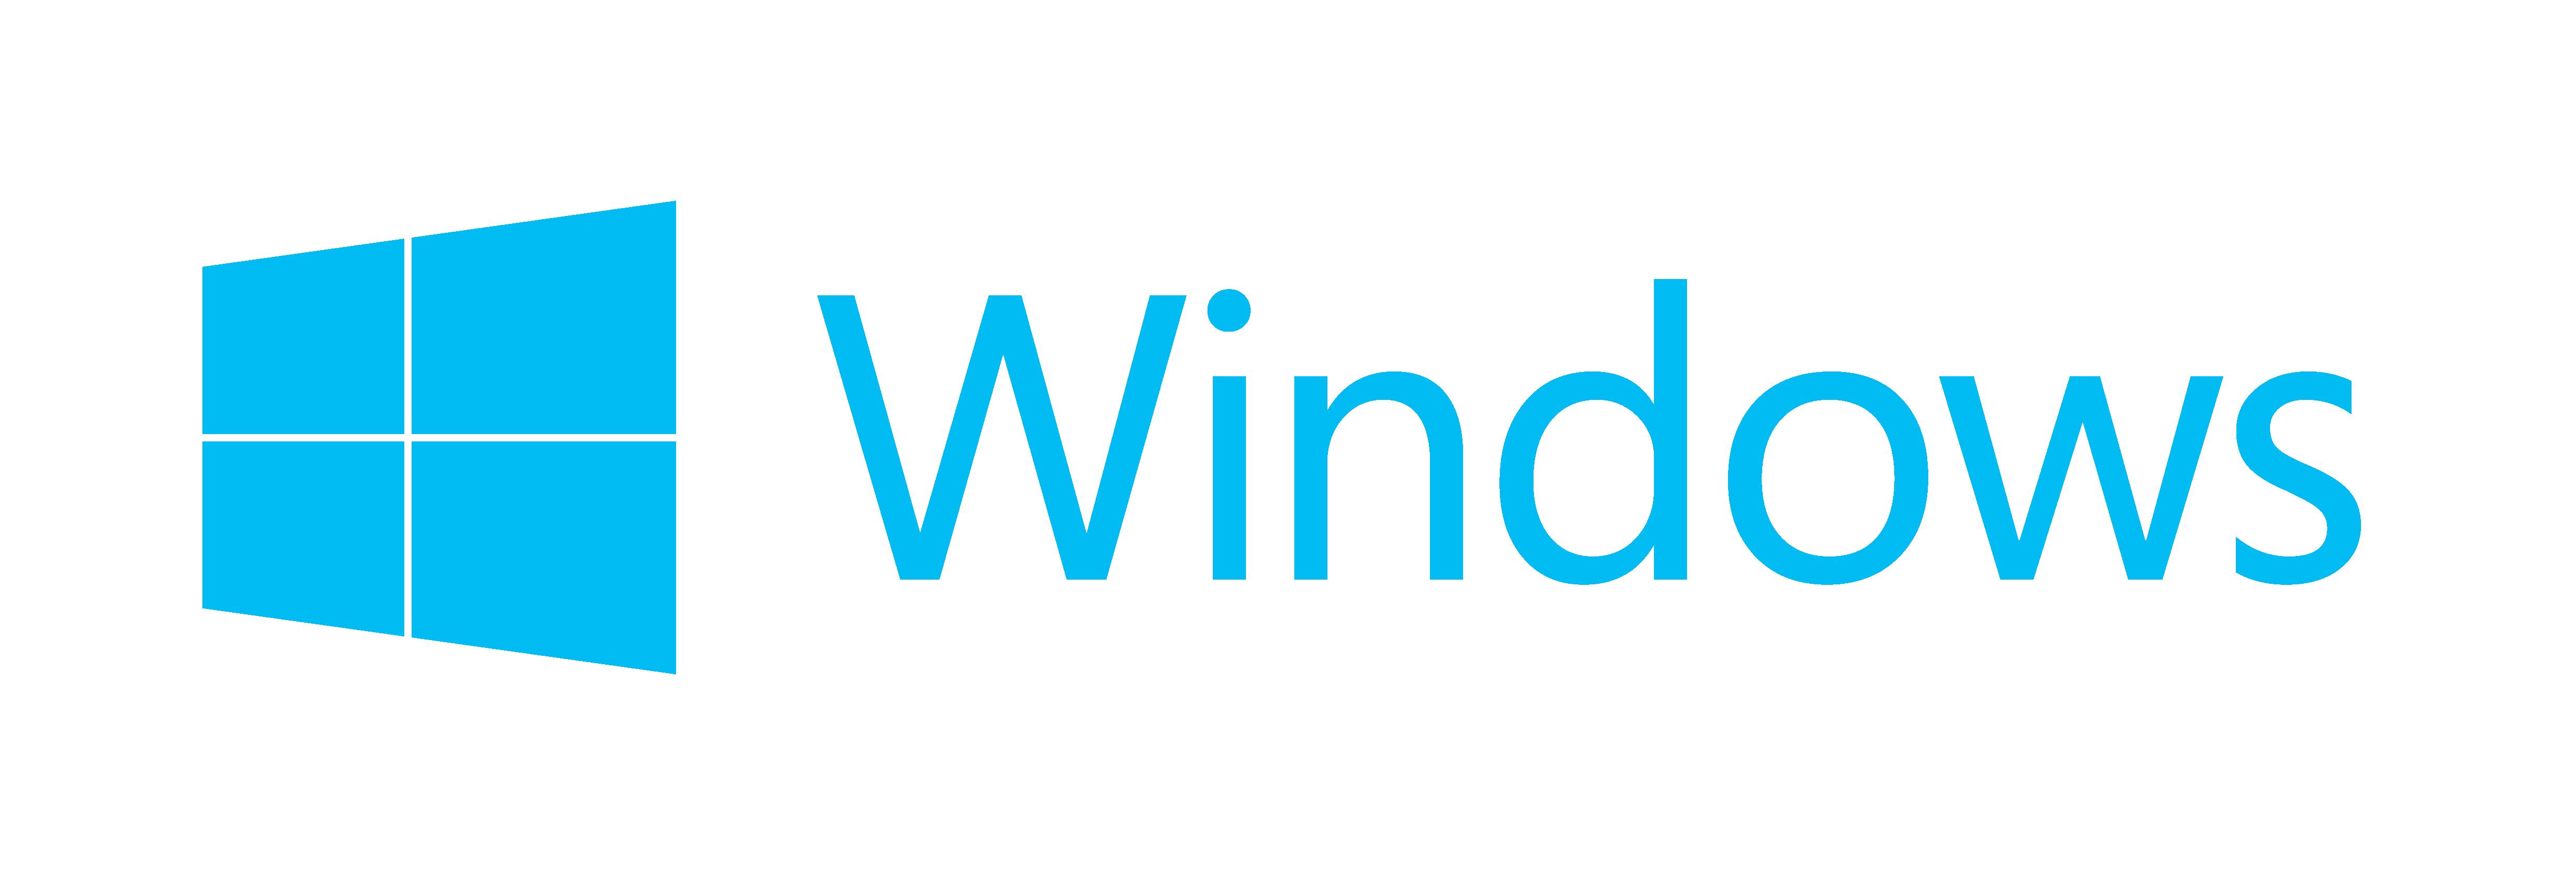 Microsoft Windows Logo PNG - 97795